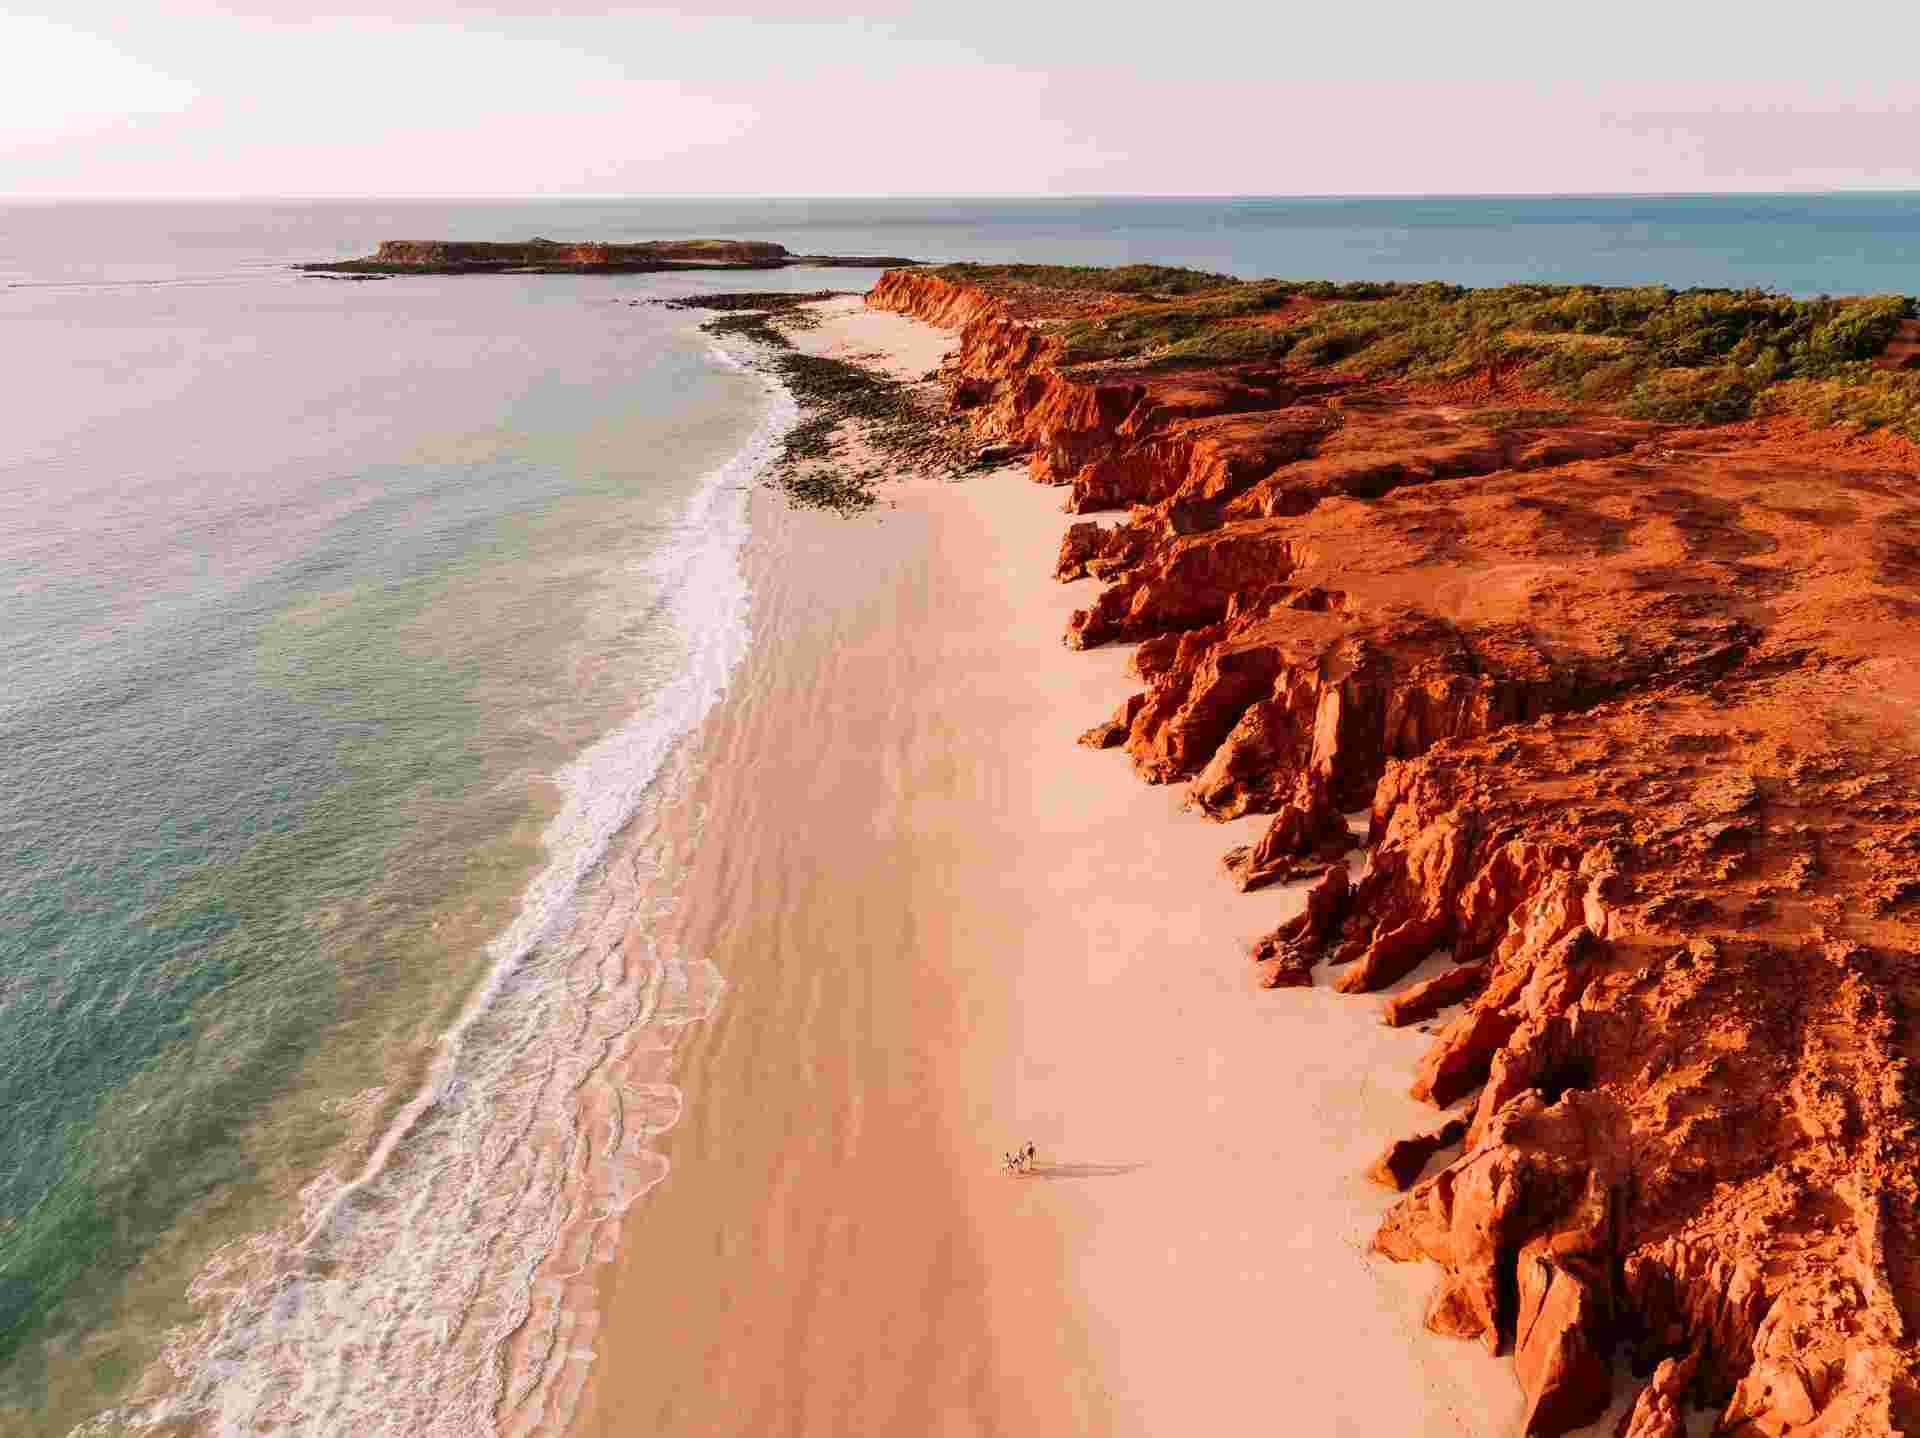 The Ardi cultural drive of Western Australia